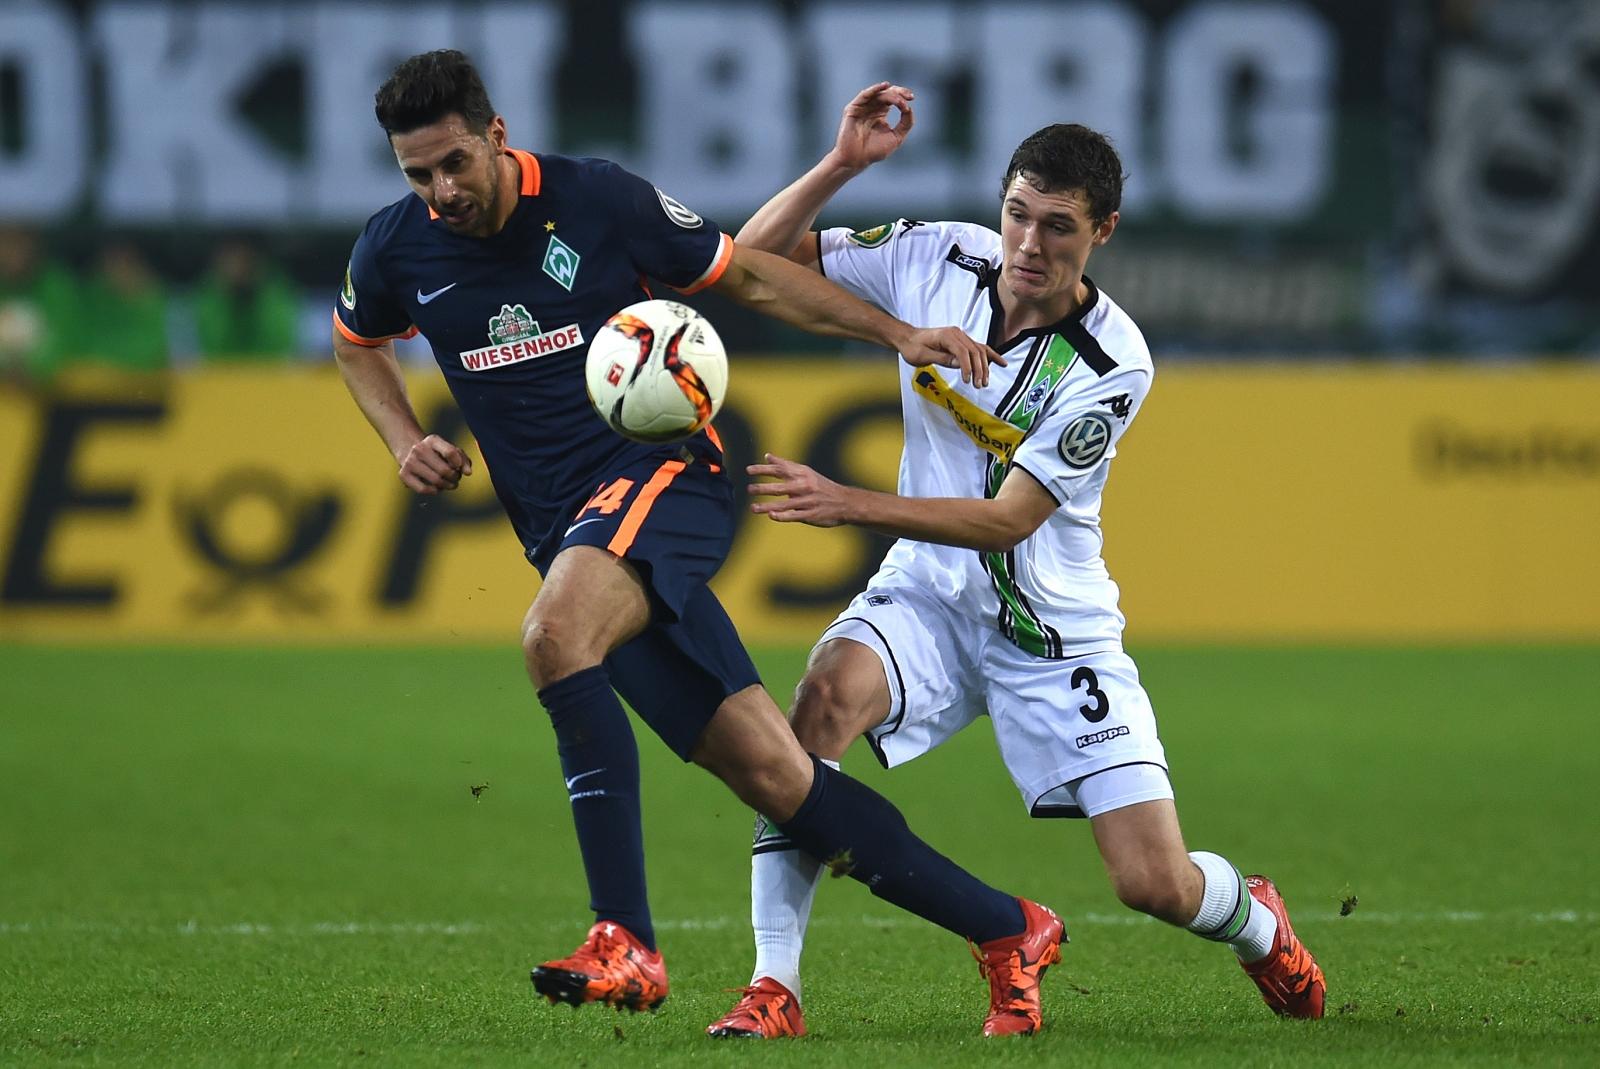 Transfers Borussia Mönchengladbach